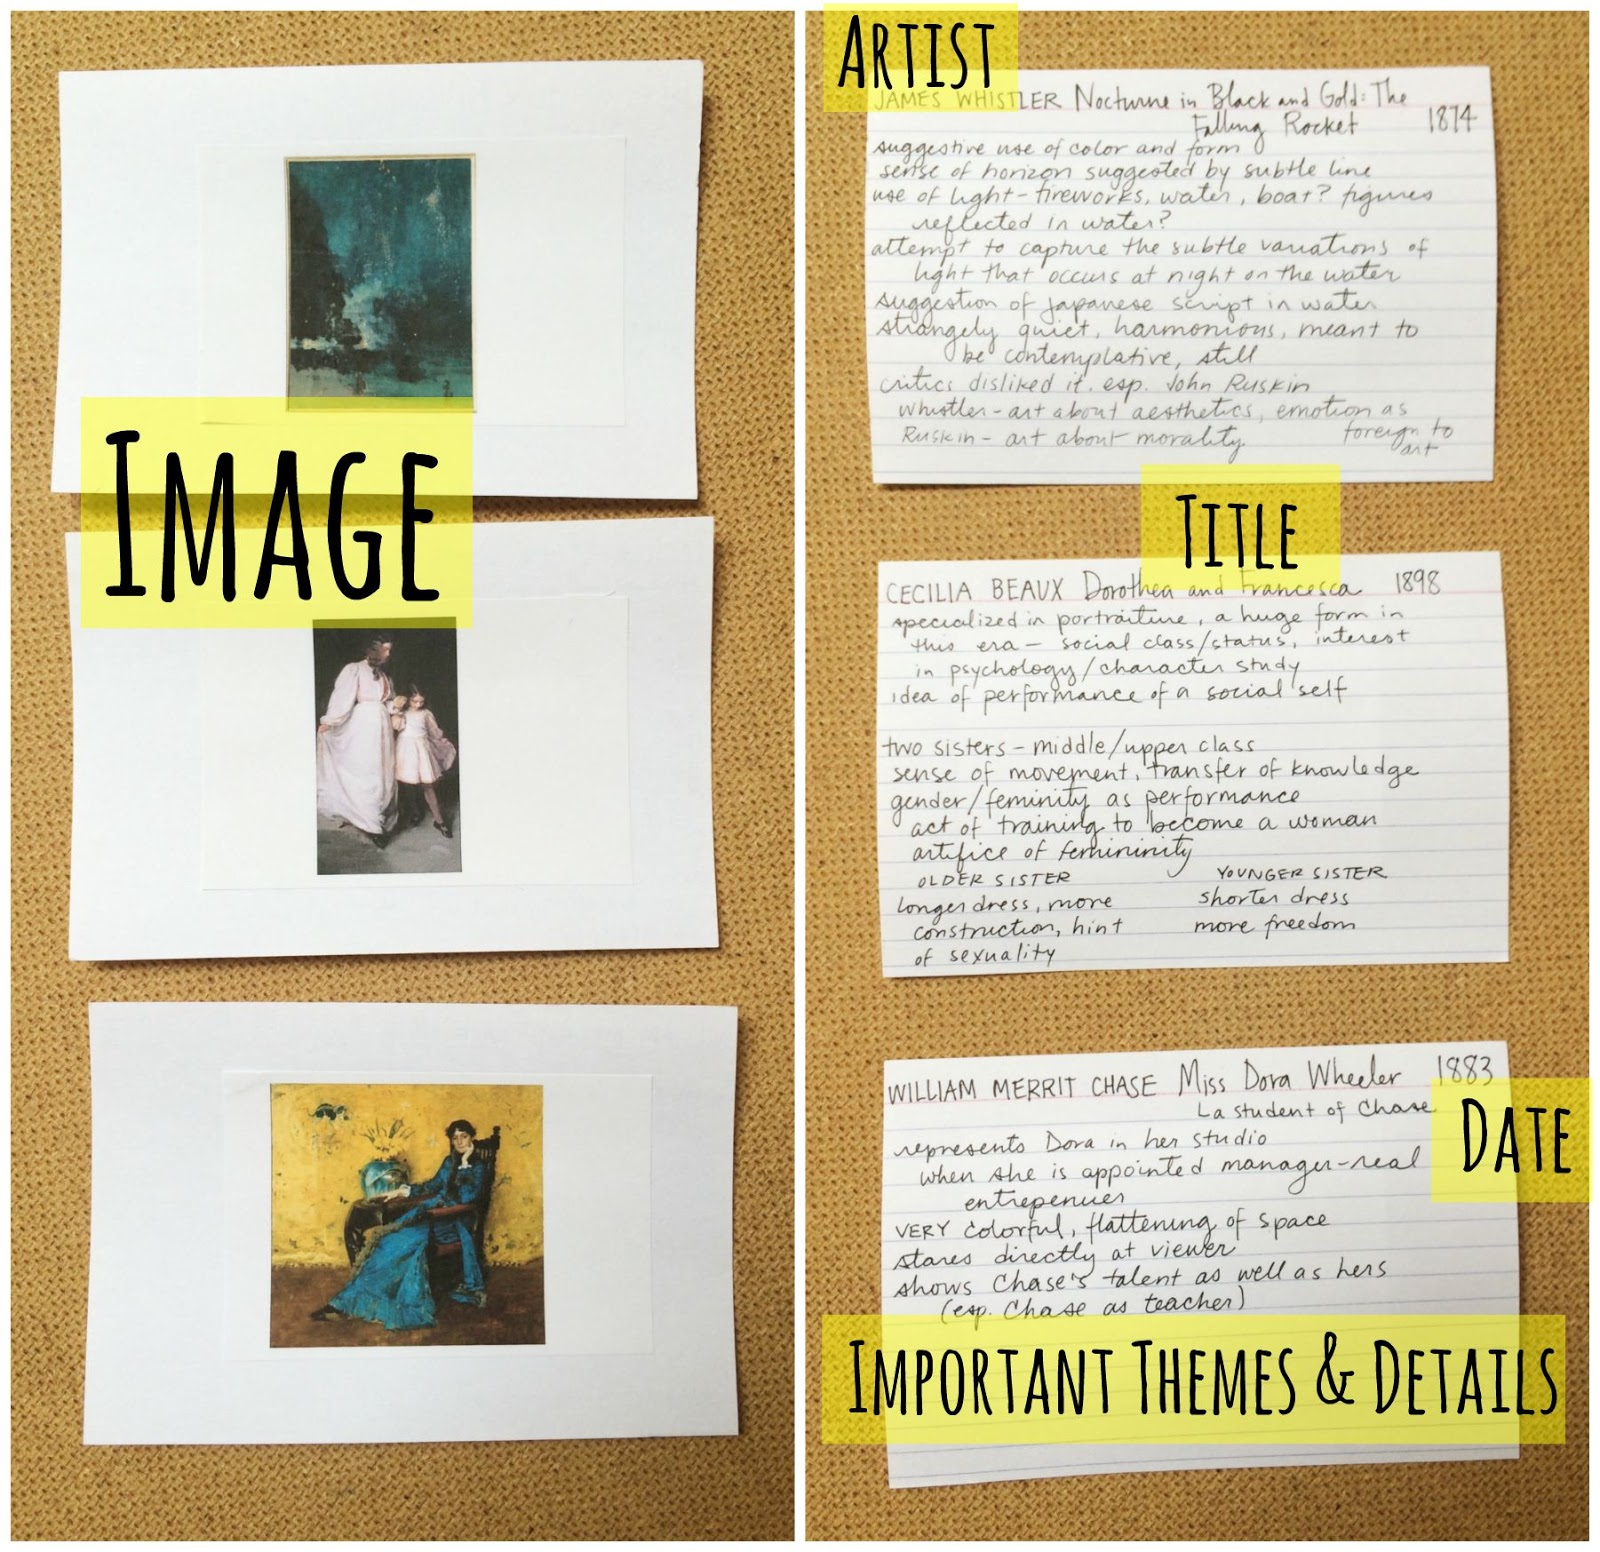 dalleva how to write art history